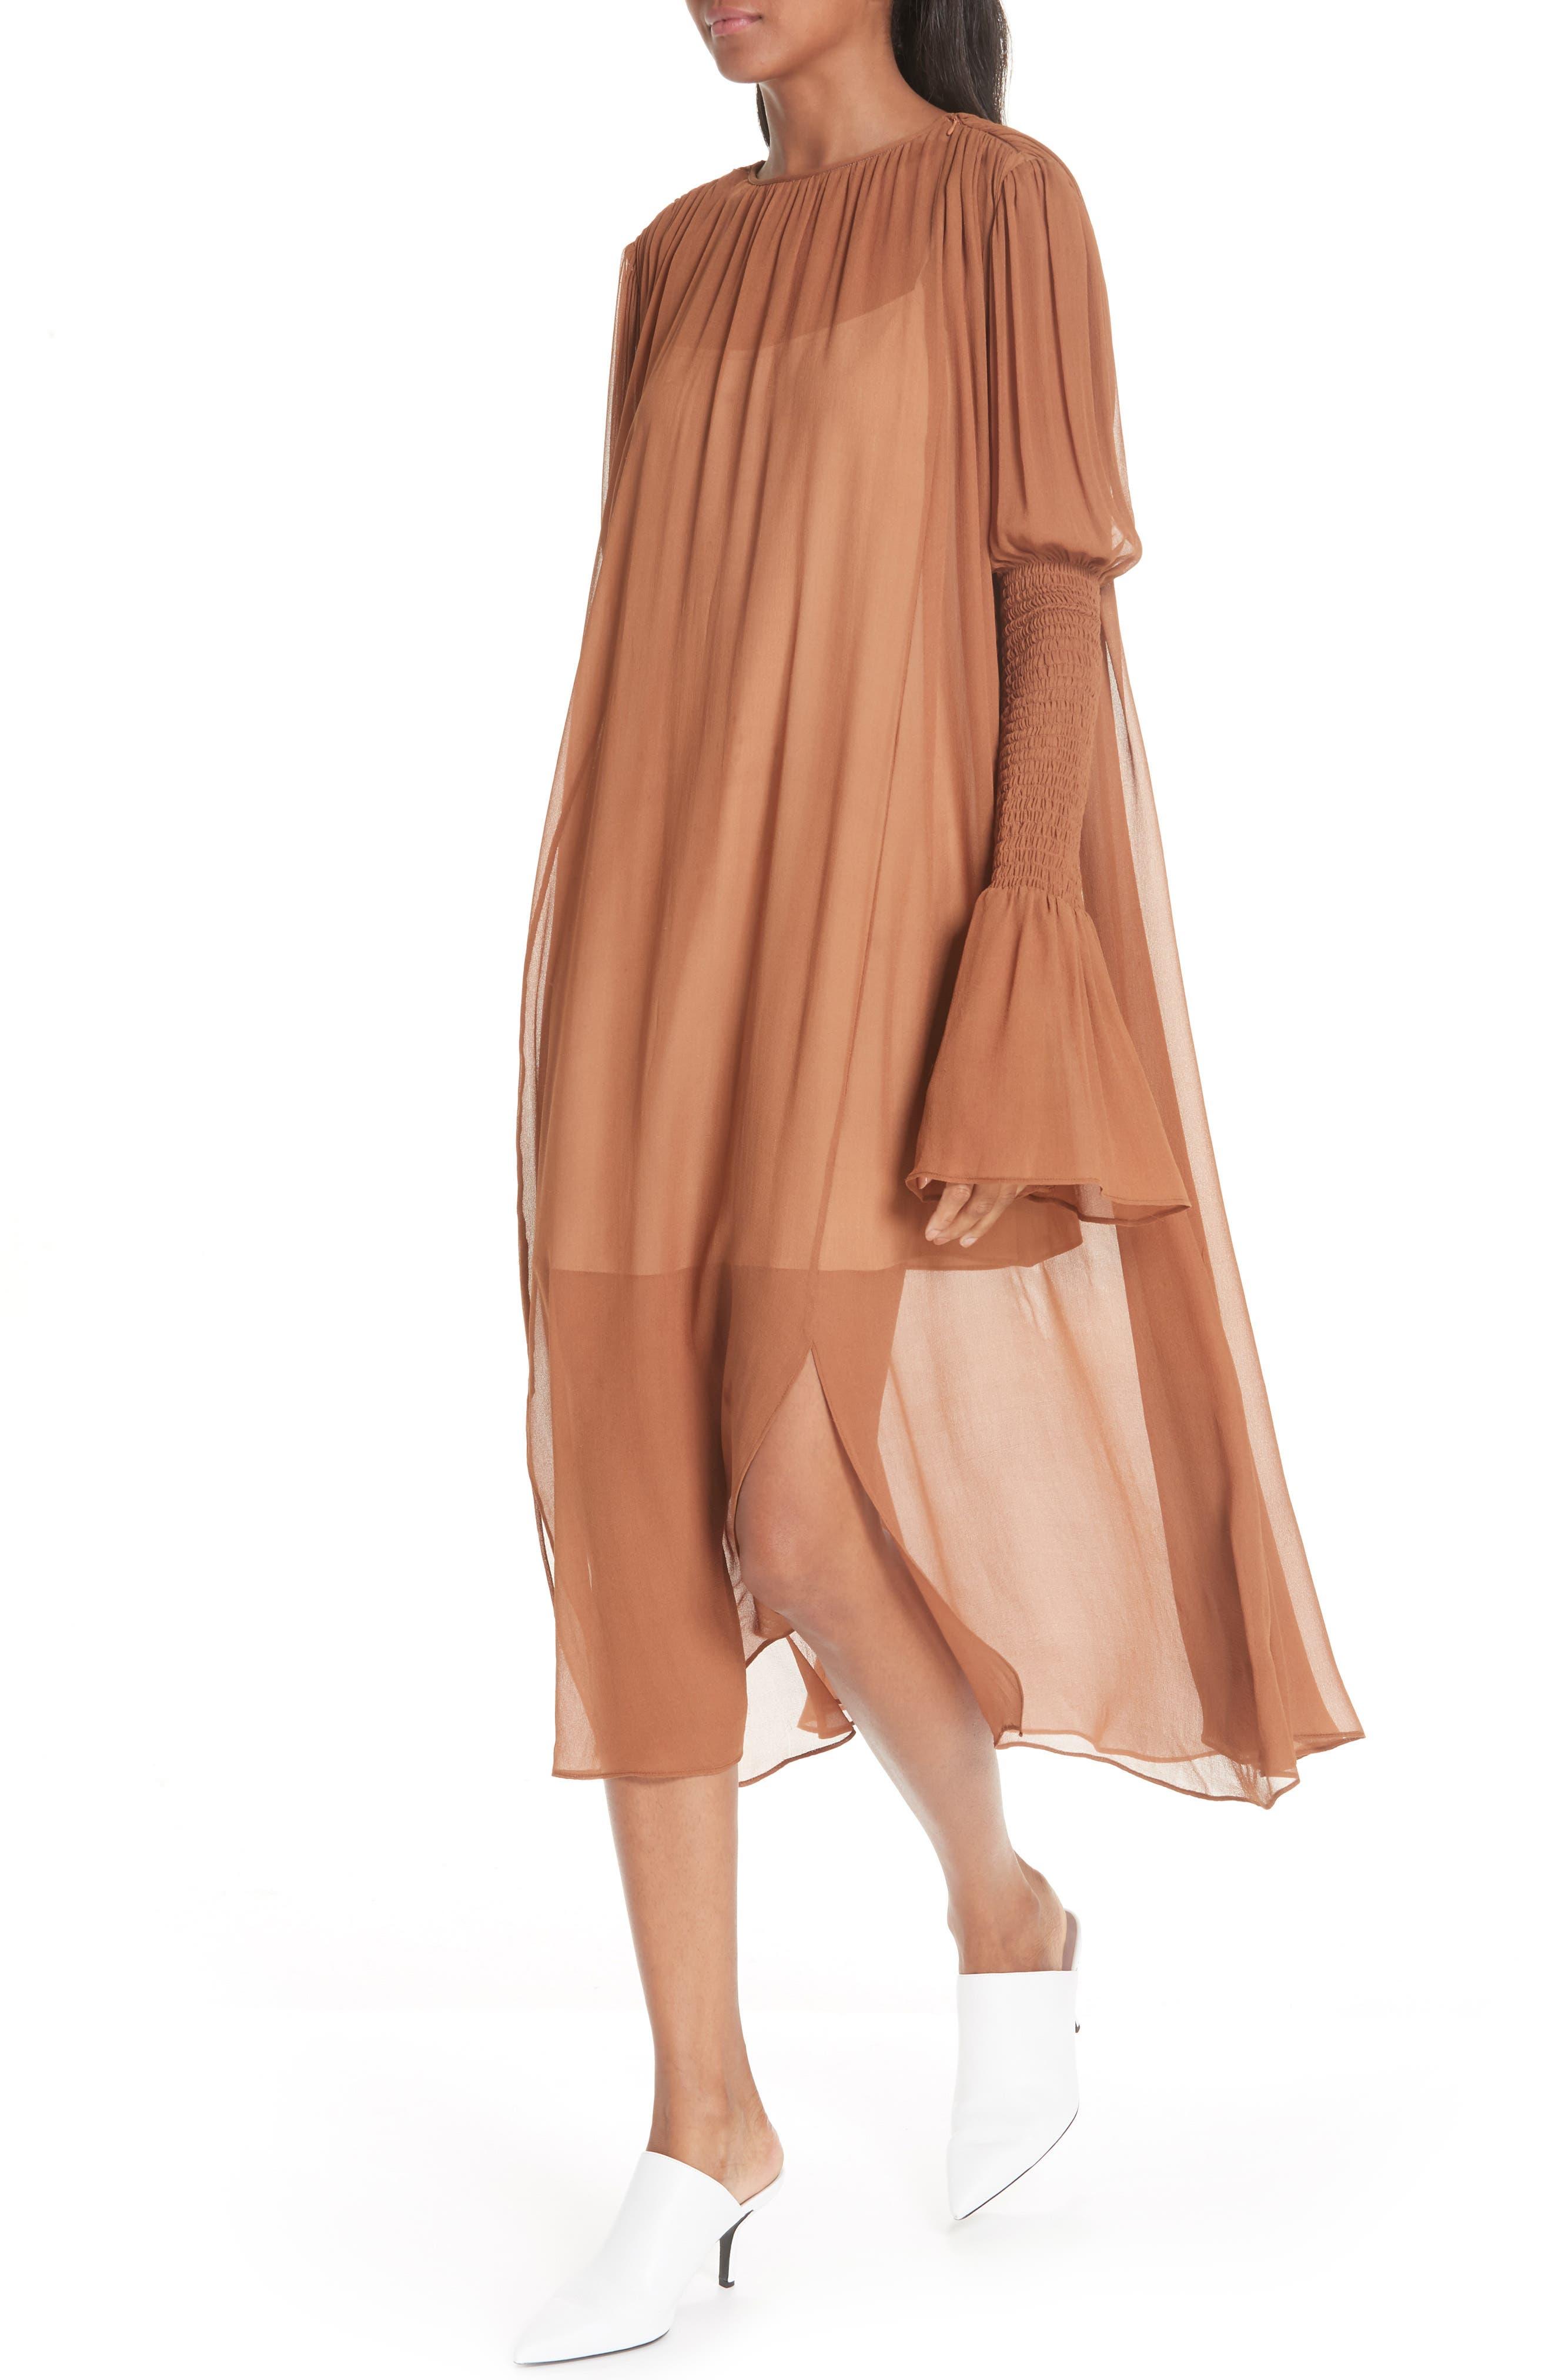 CIENNE,                             The Costa Silk Dress,                             Alternate thumbnail 4, color,                             200